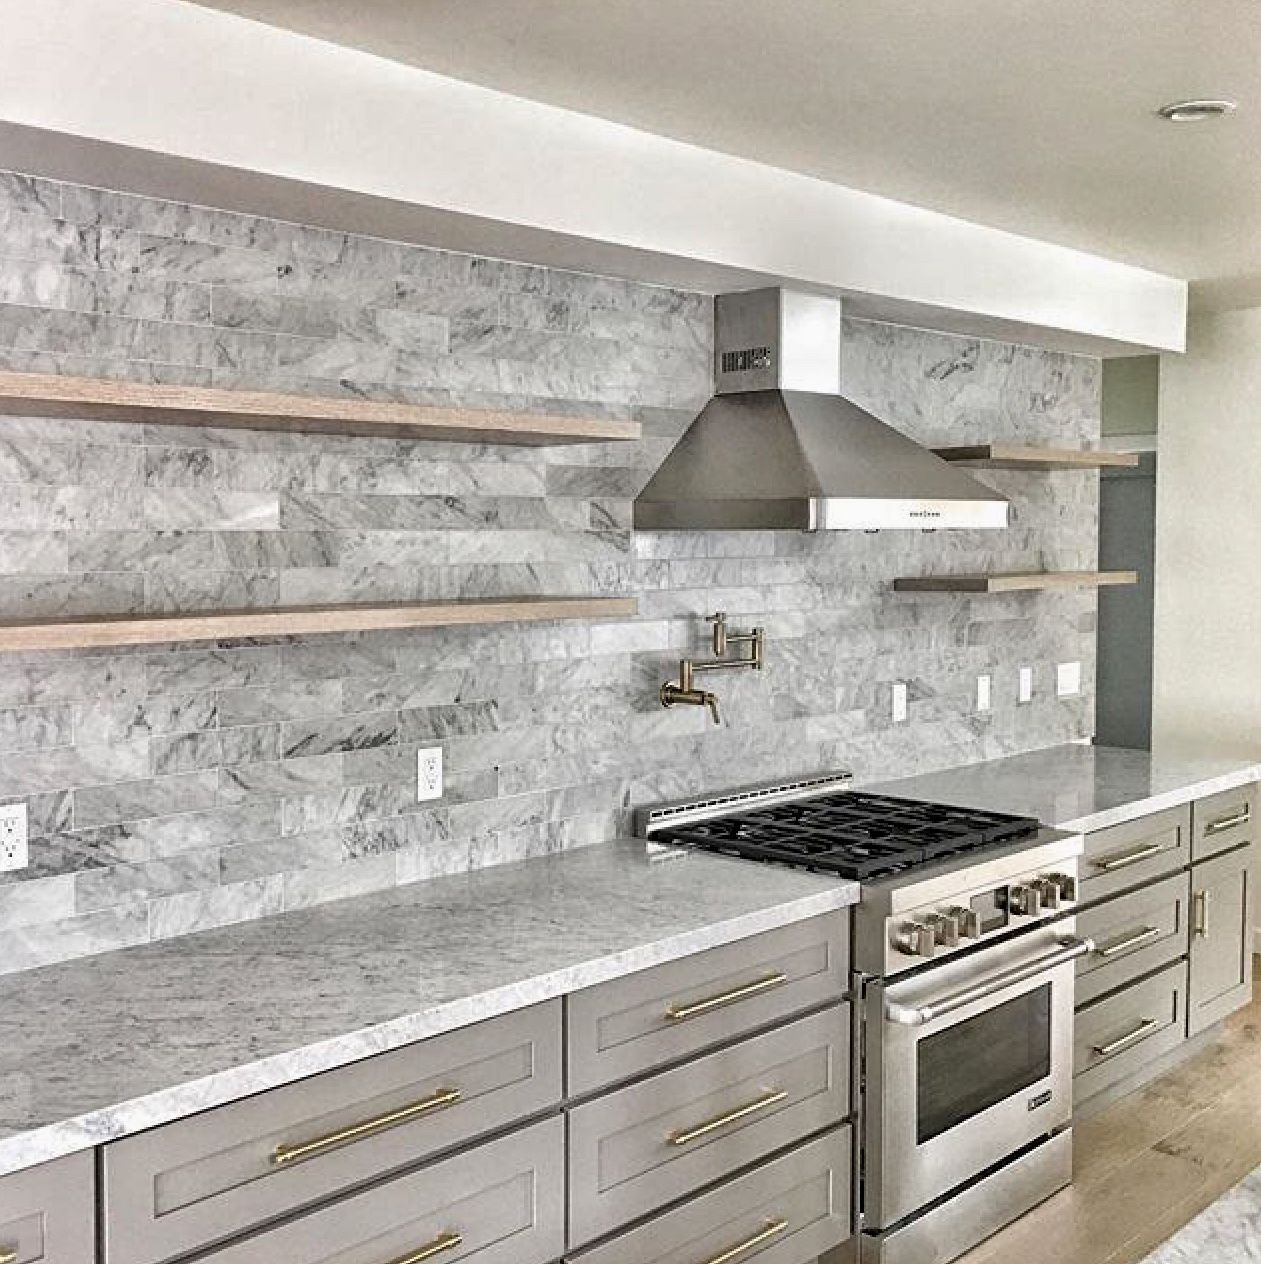 Zline 36 In Wall Mount Range Hood In Stainless Steel Kl3 36 Kitchen Backsplash Designs Kitchen Backsplash Trends Wood Shelves Kitchen